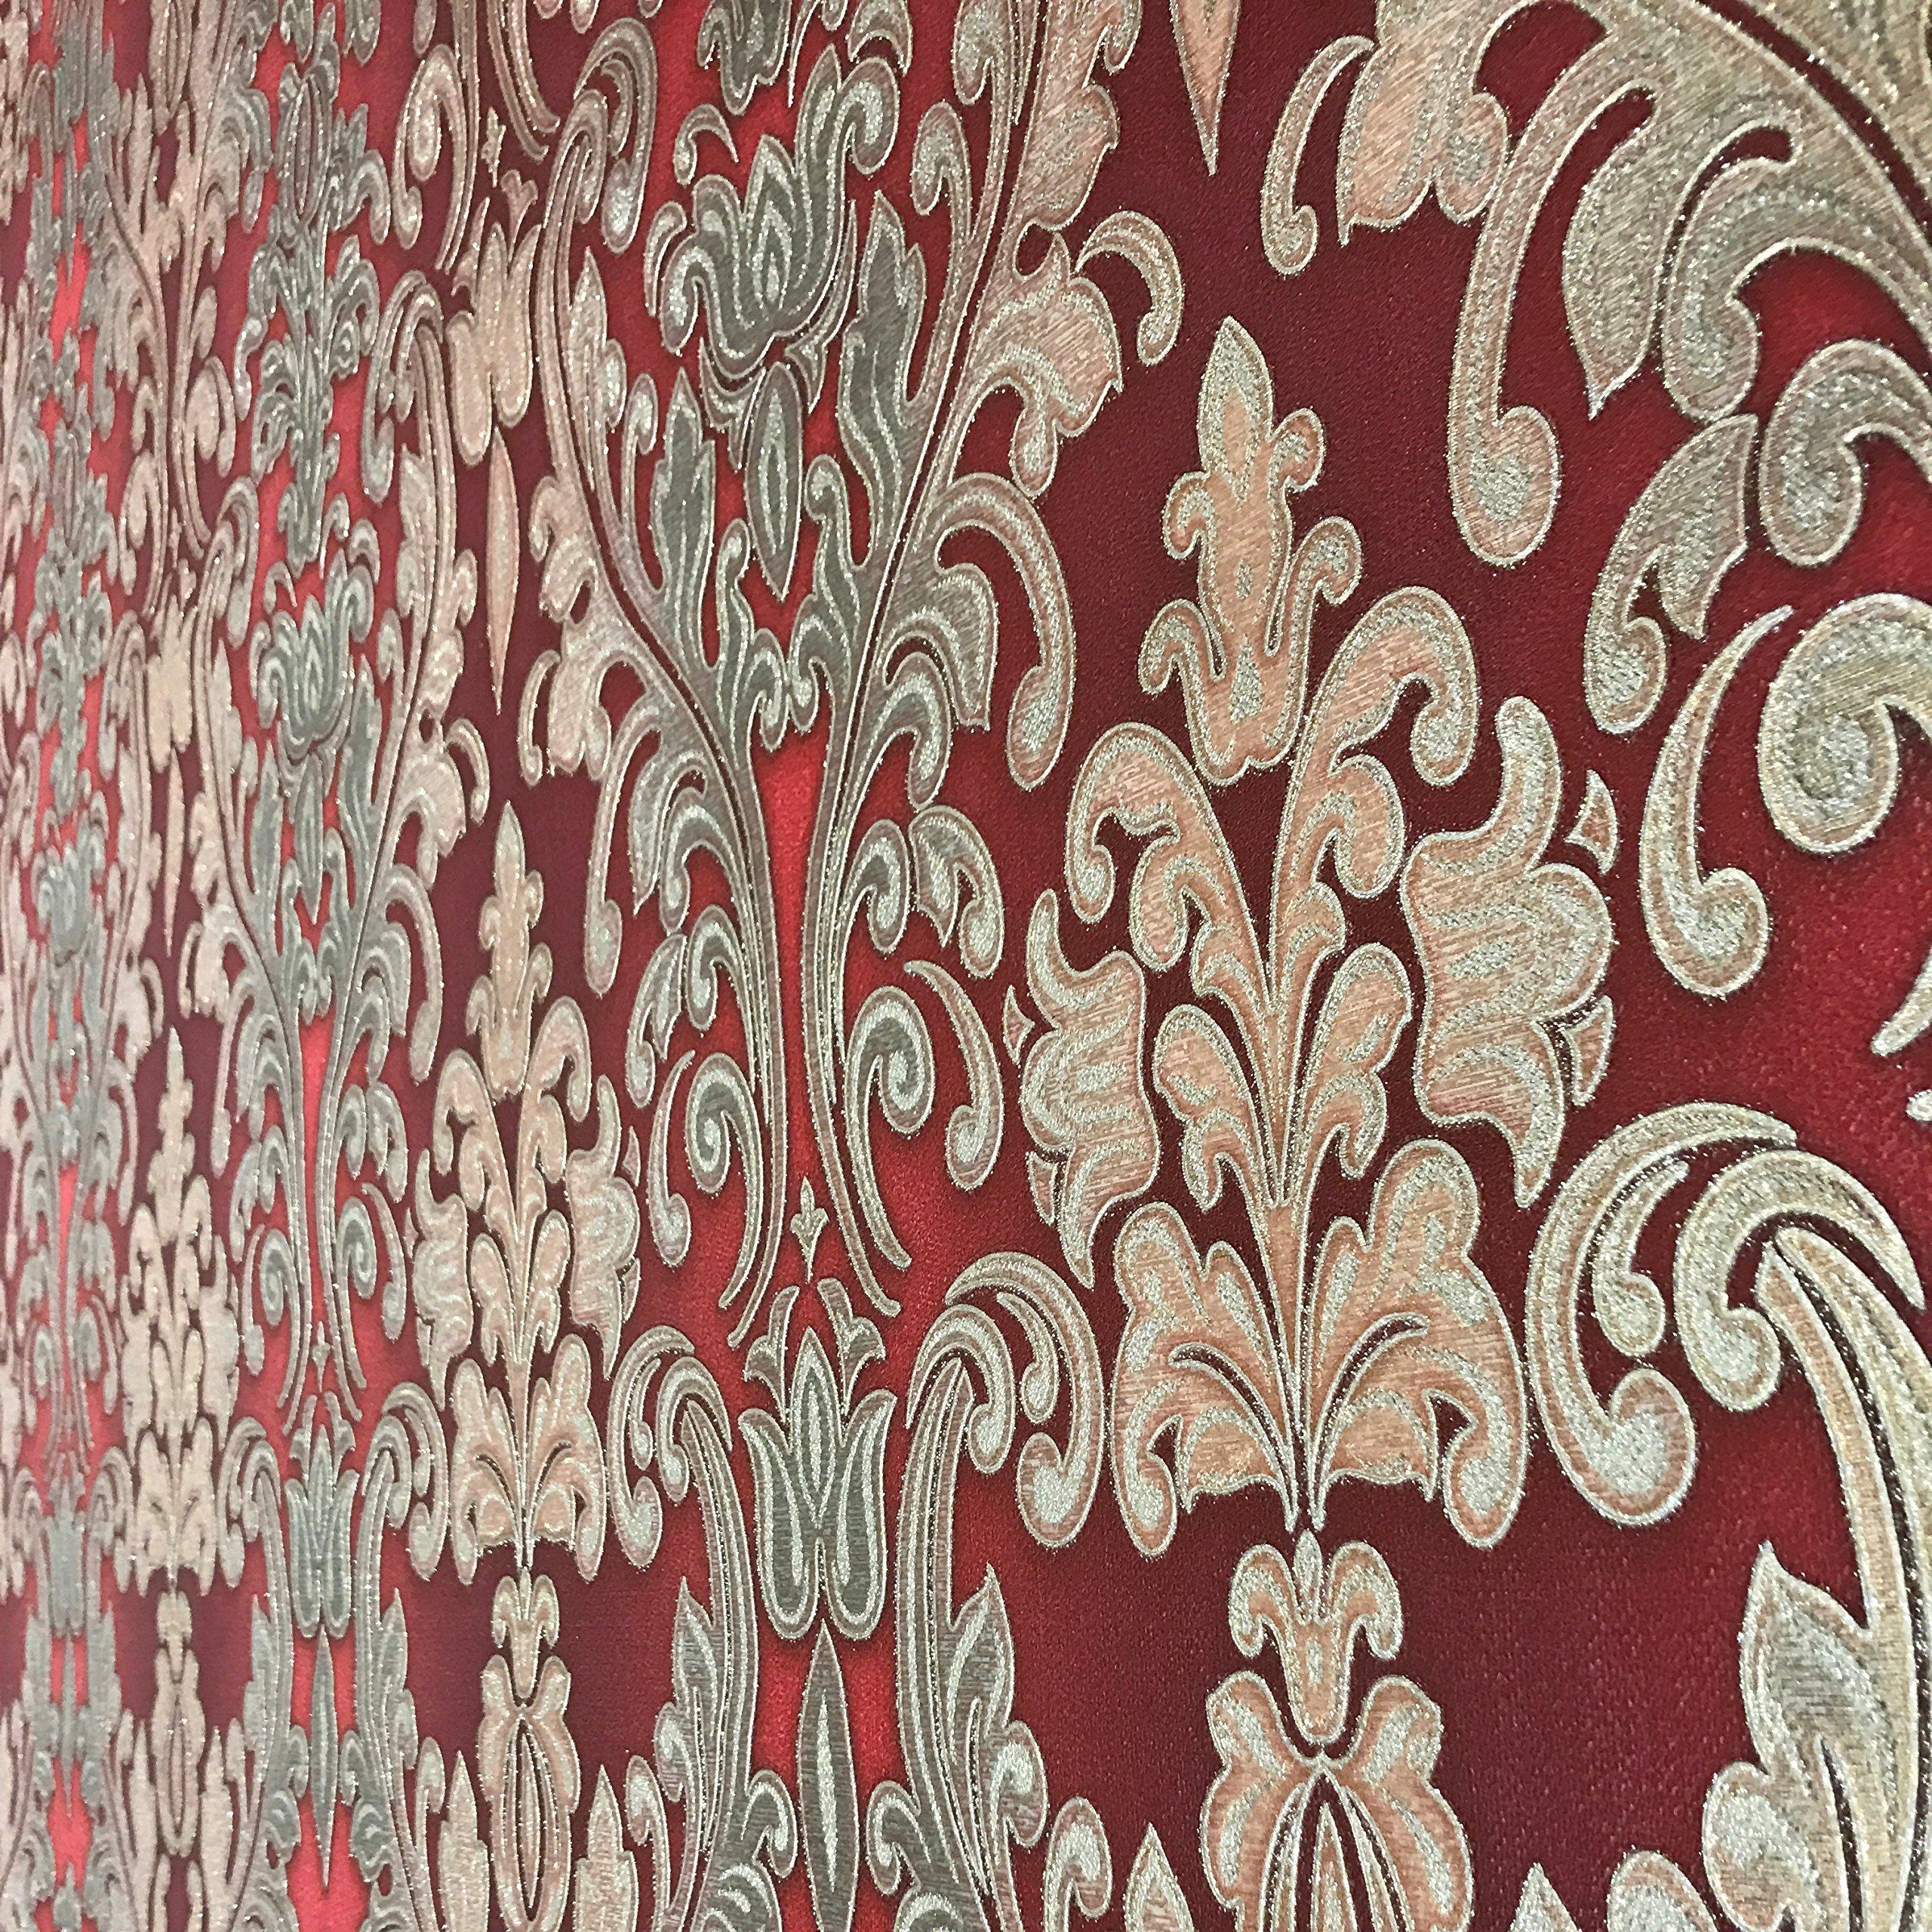 QUADRUPLE ROLL 113.52sq.ft (4 single rolls size) European Slavyanski wallcovering washable victorian pattern Vinyl Non-Woven Wallpaper red burgundy gold textured stripe glitters metallic damask 3D by Slavyanski